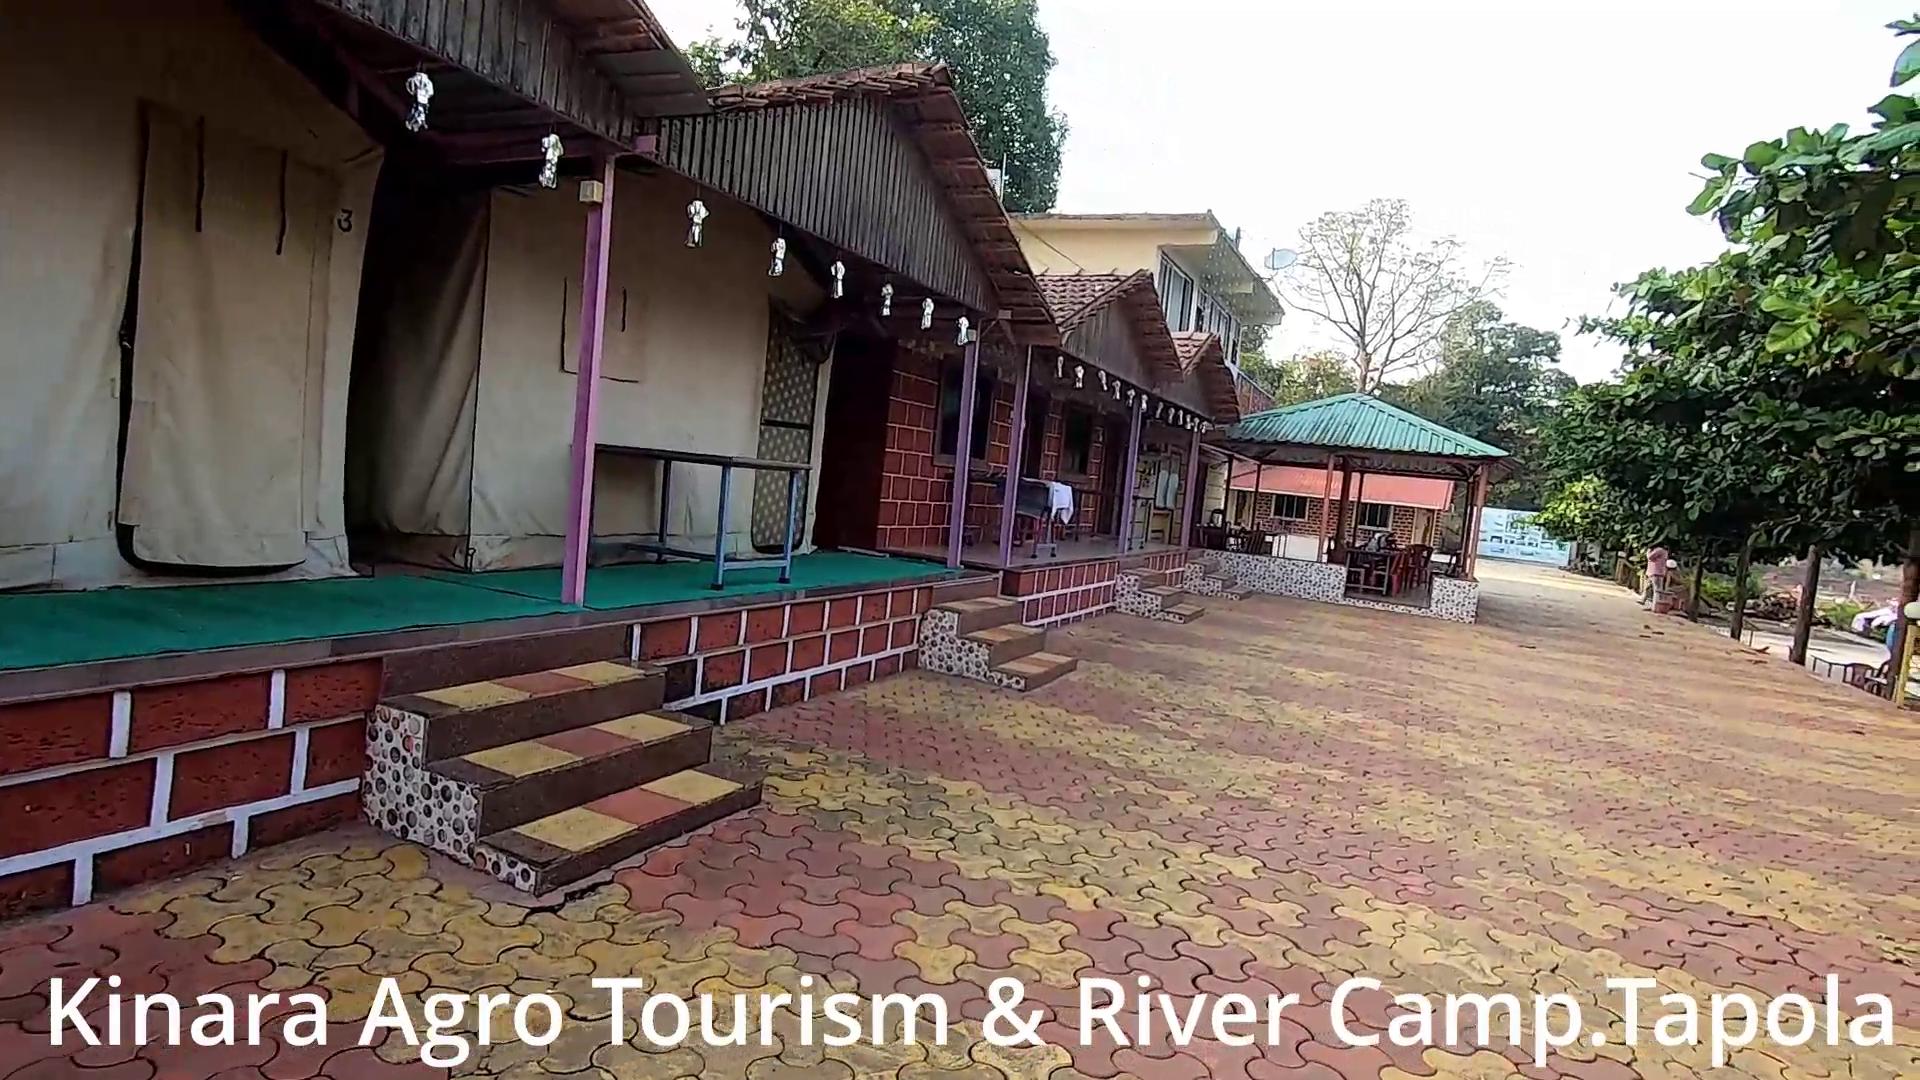 Kinara Agro Tourism & River Camp Tapola